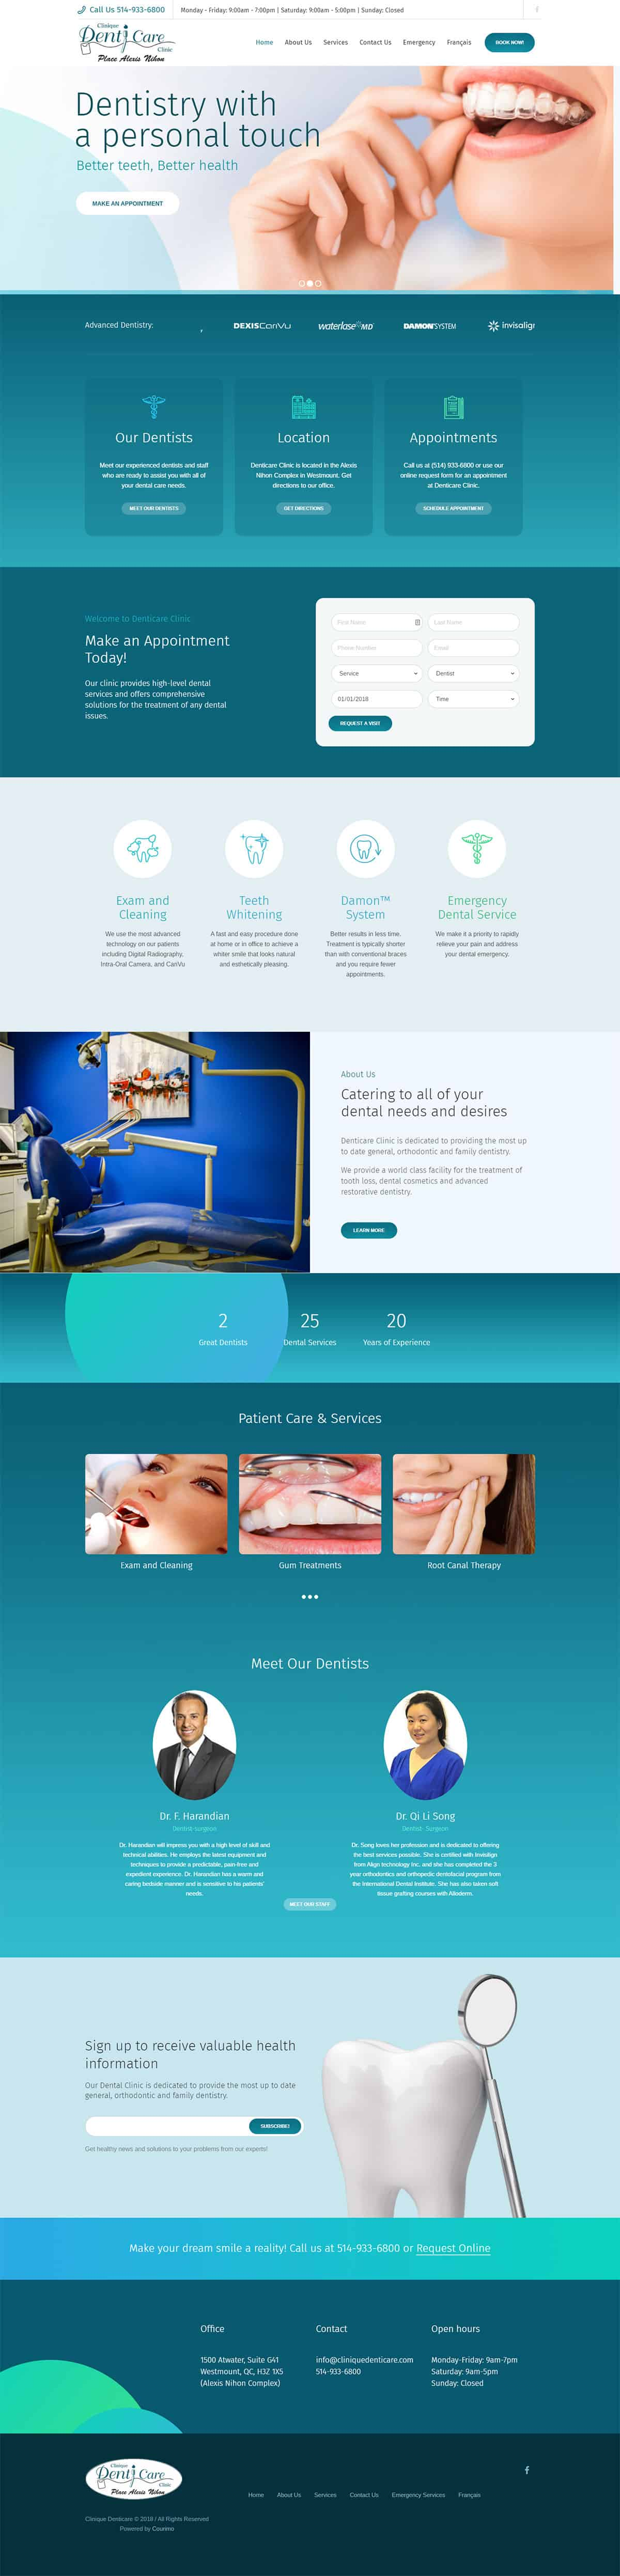 DentiCare-Website-Development-Project